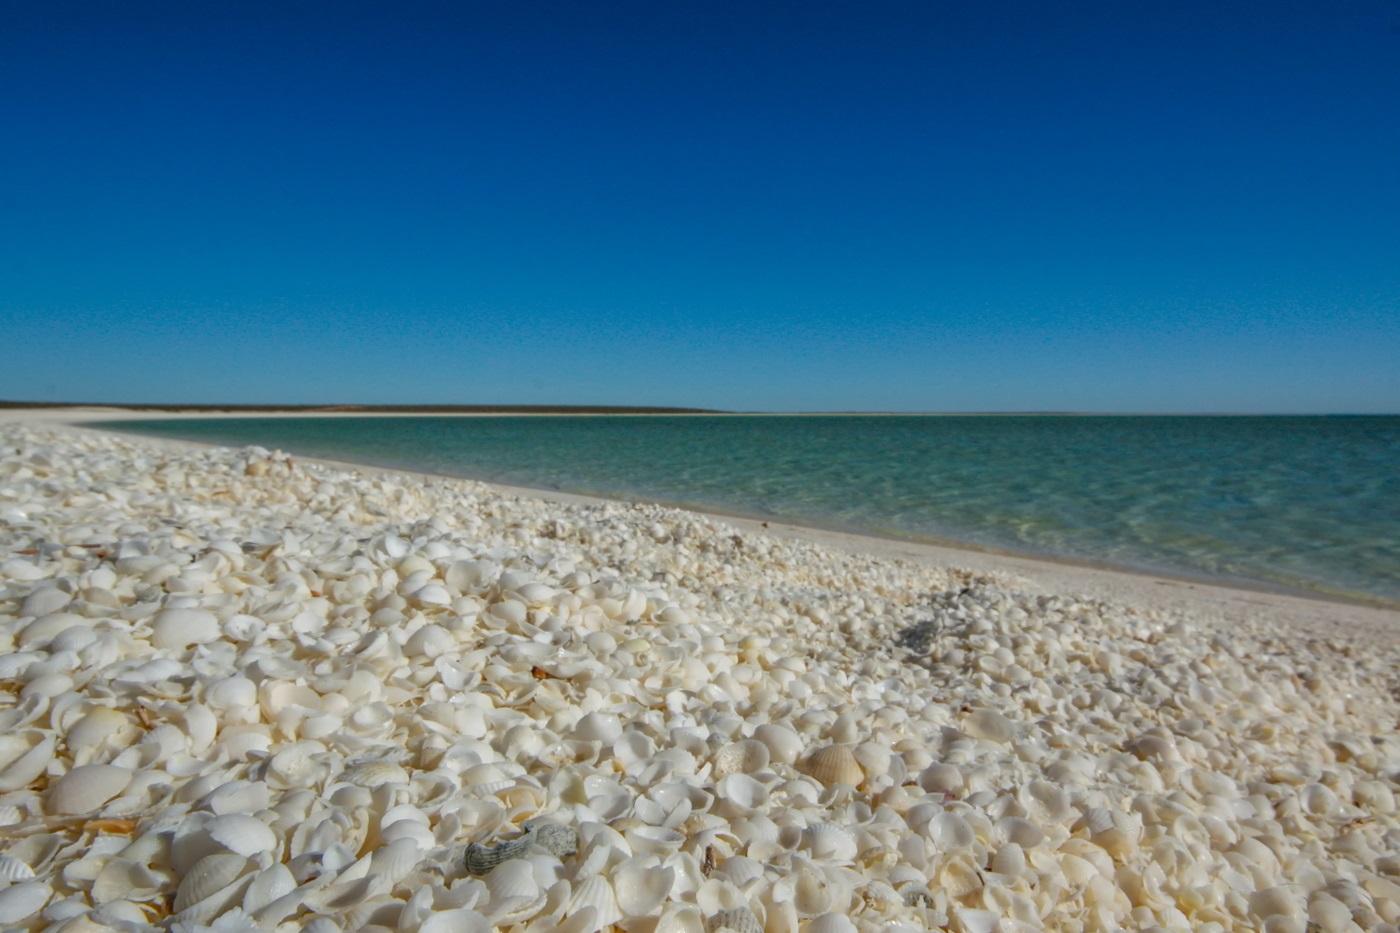 shell-beach-australia